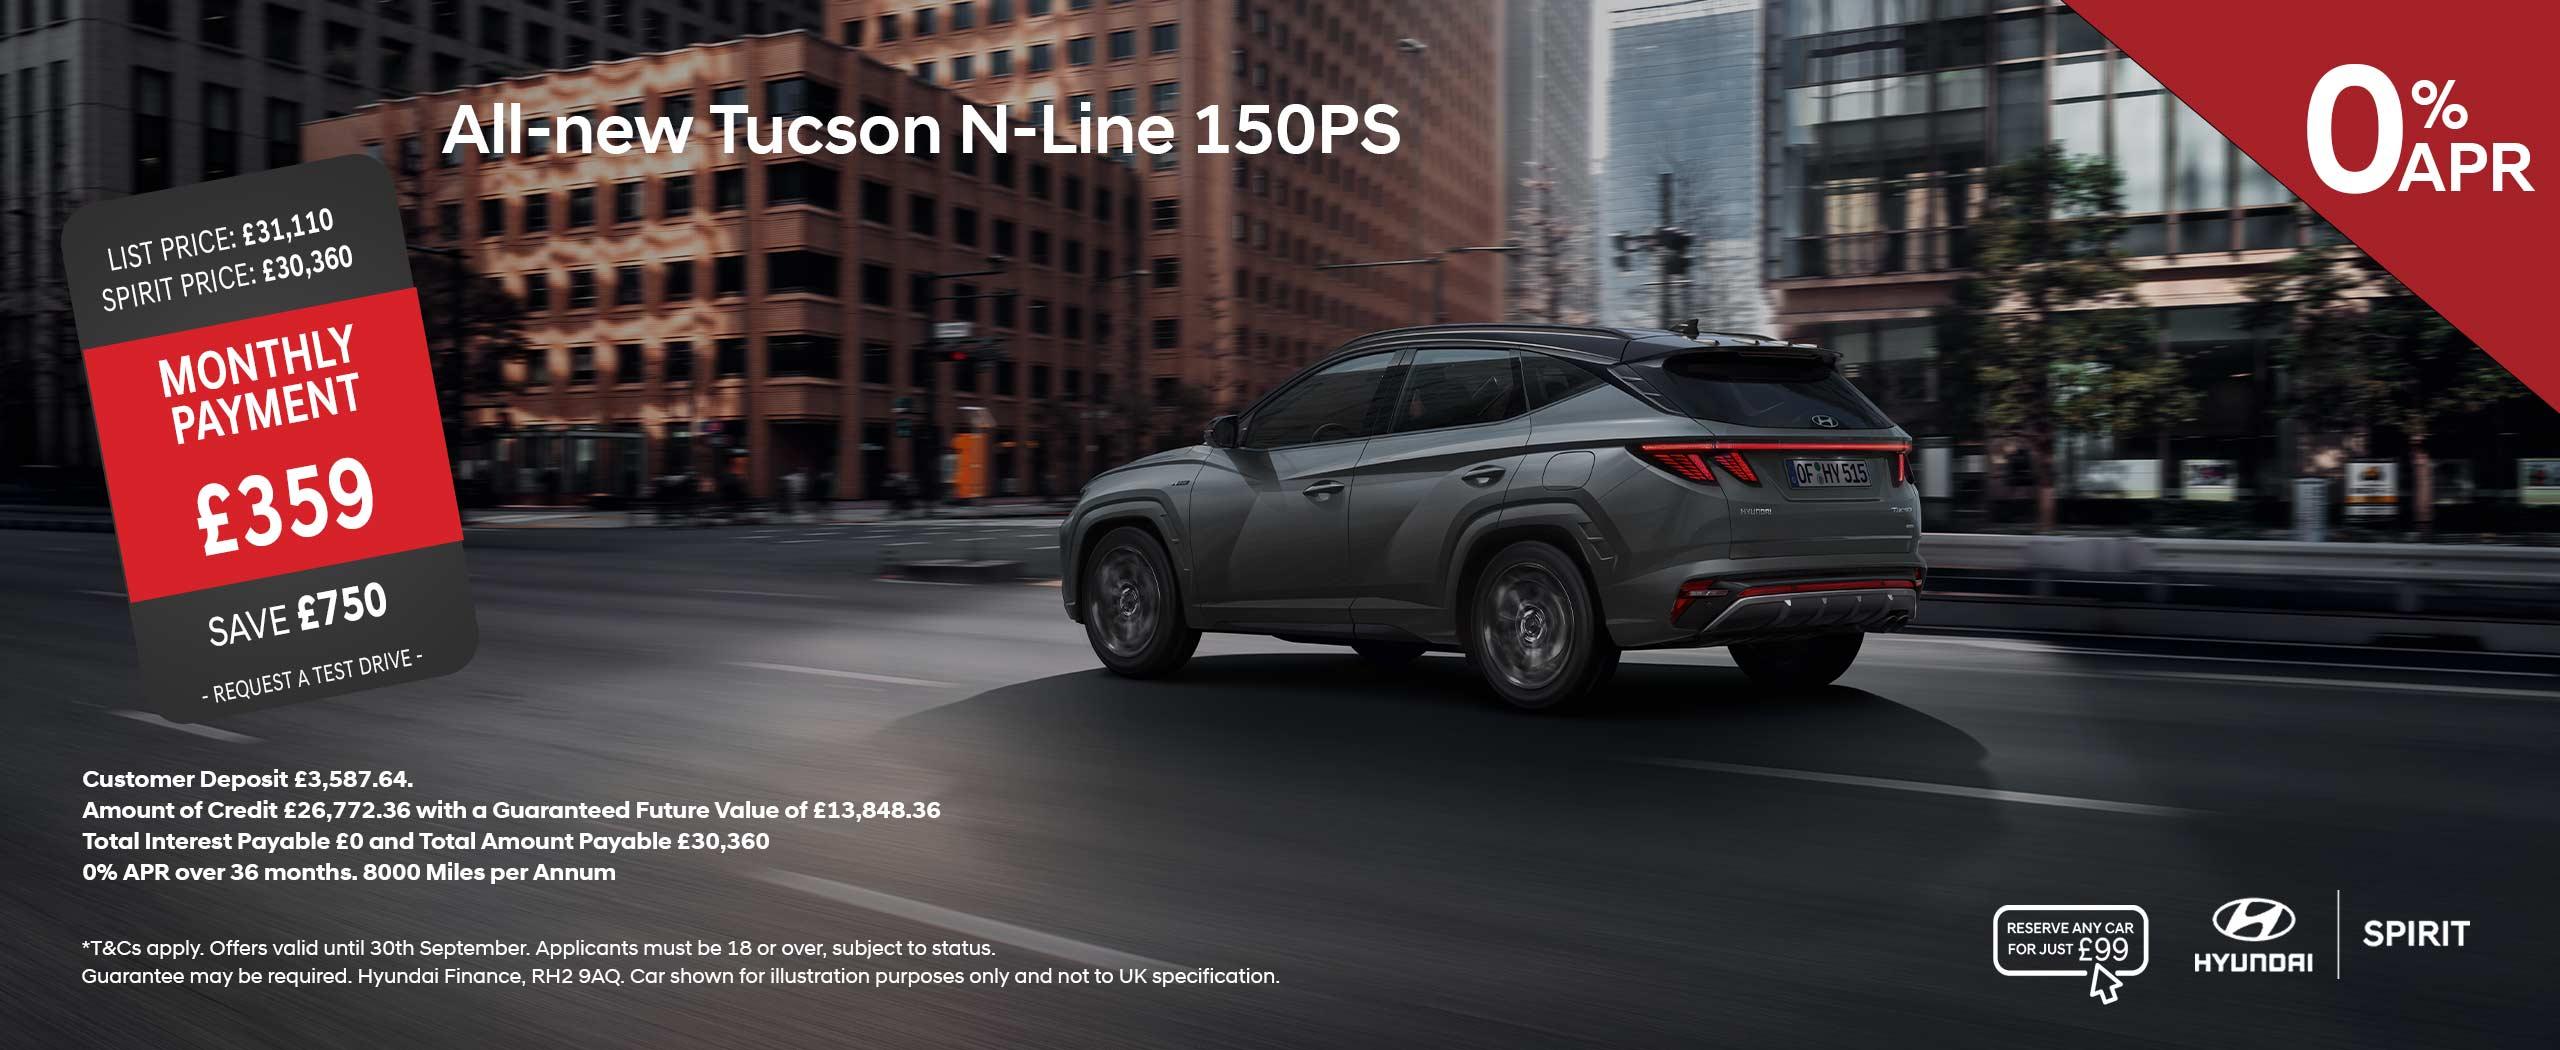 All-New Tucson N-Line